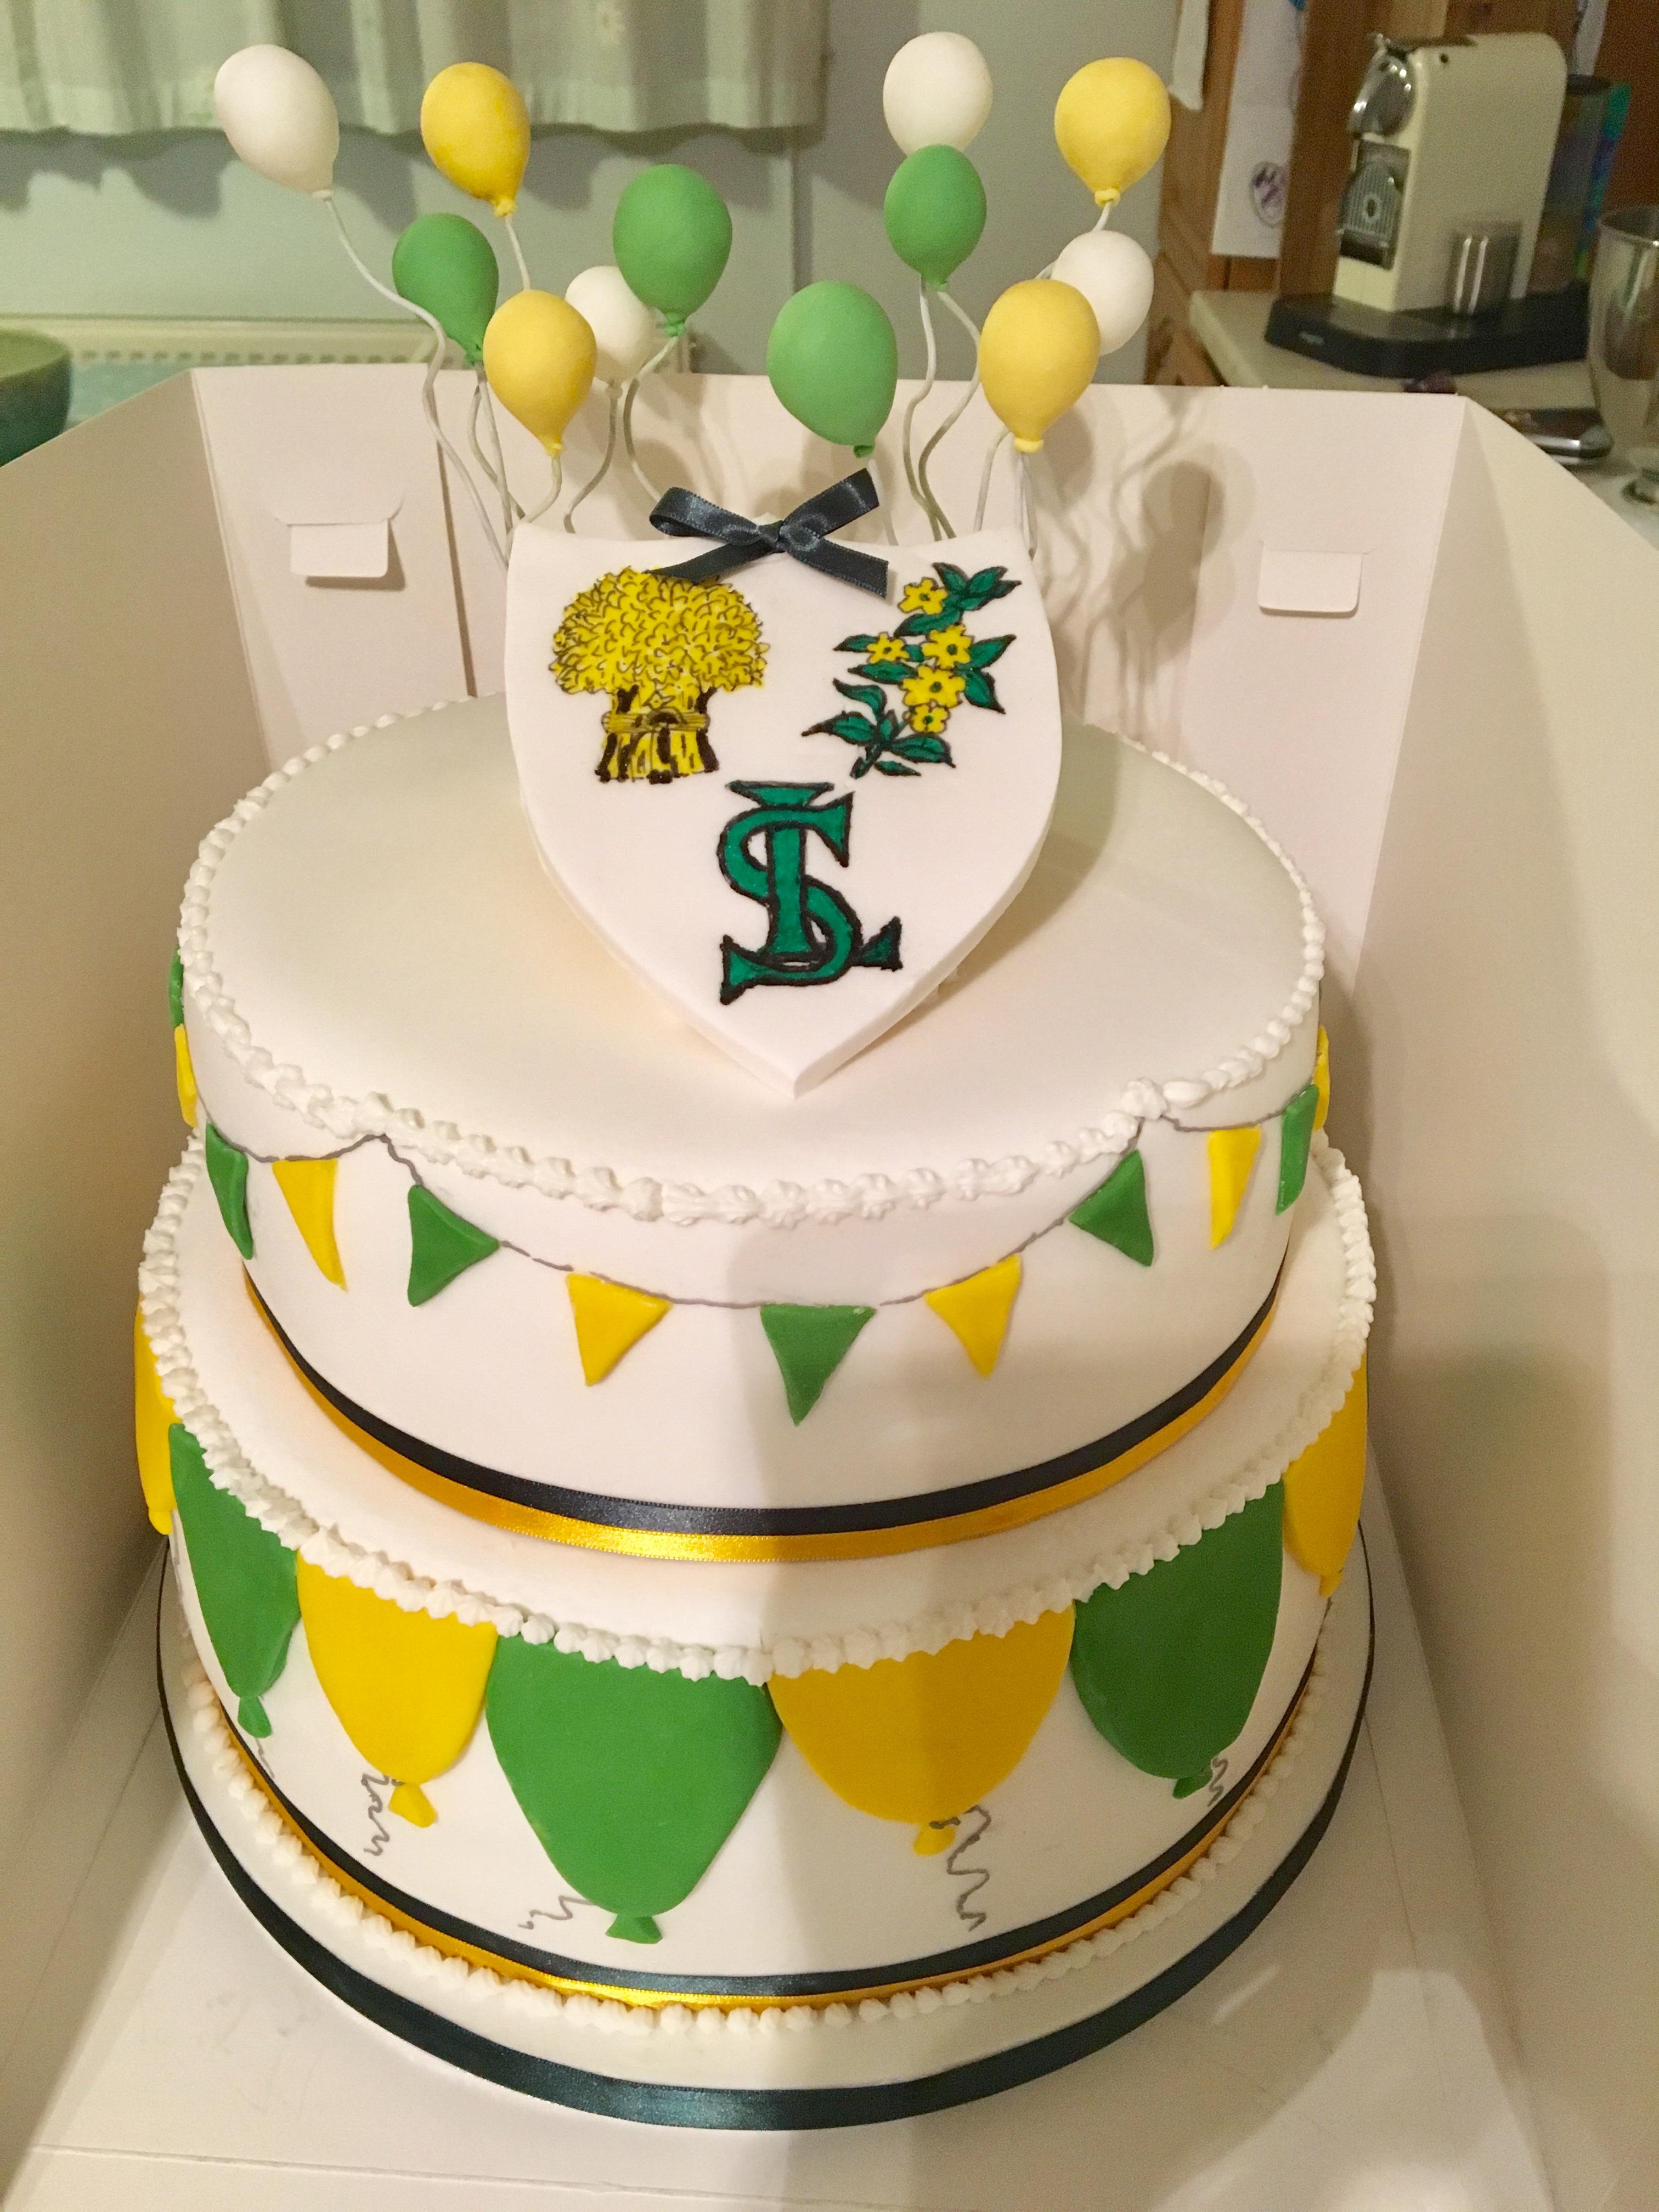 Loxwood School birthday cake